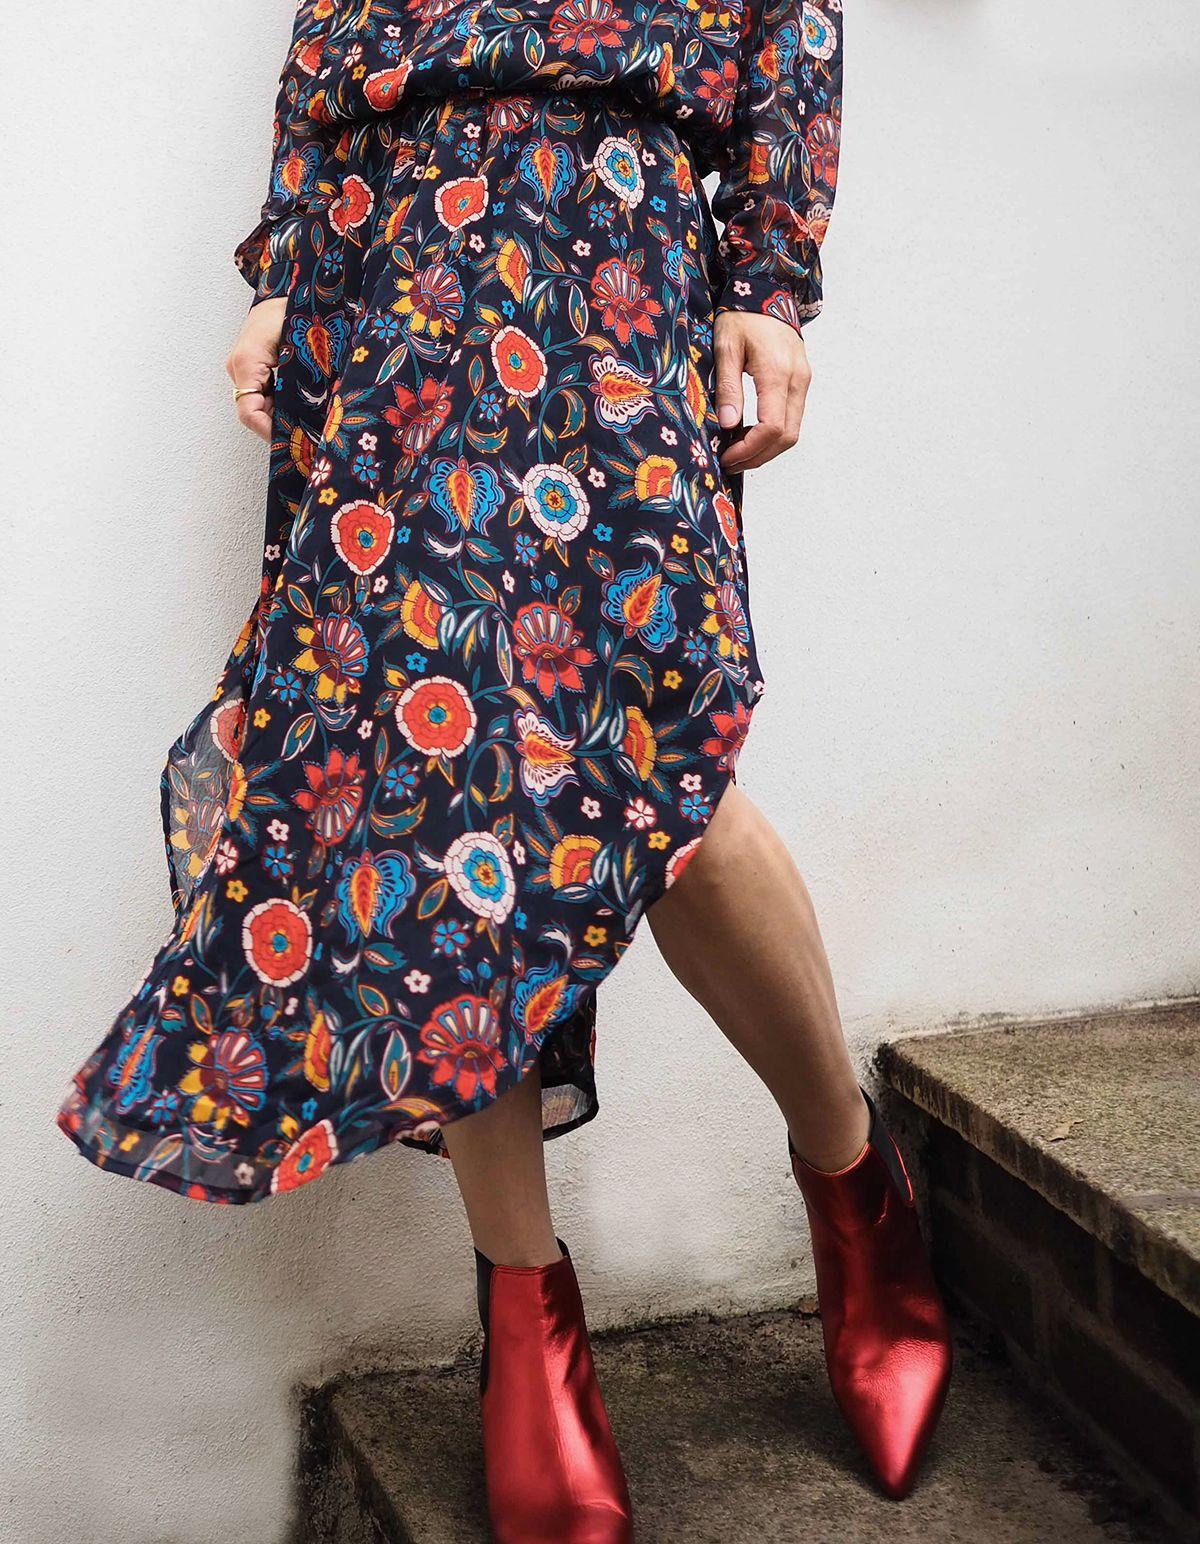 12db63e44f90 Stylonylon Edit | Hush Homewear AW18 | Floral dress & red boots ...